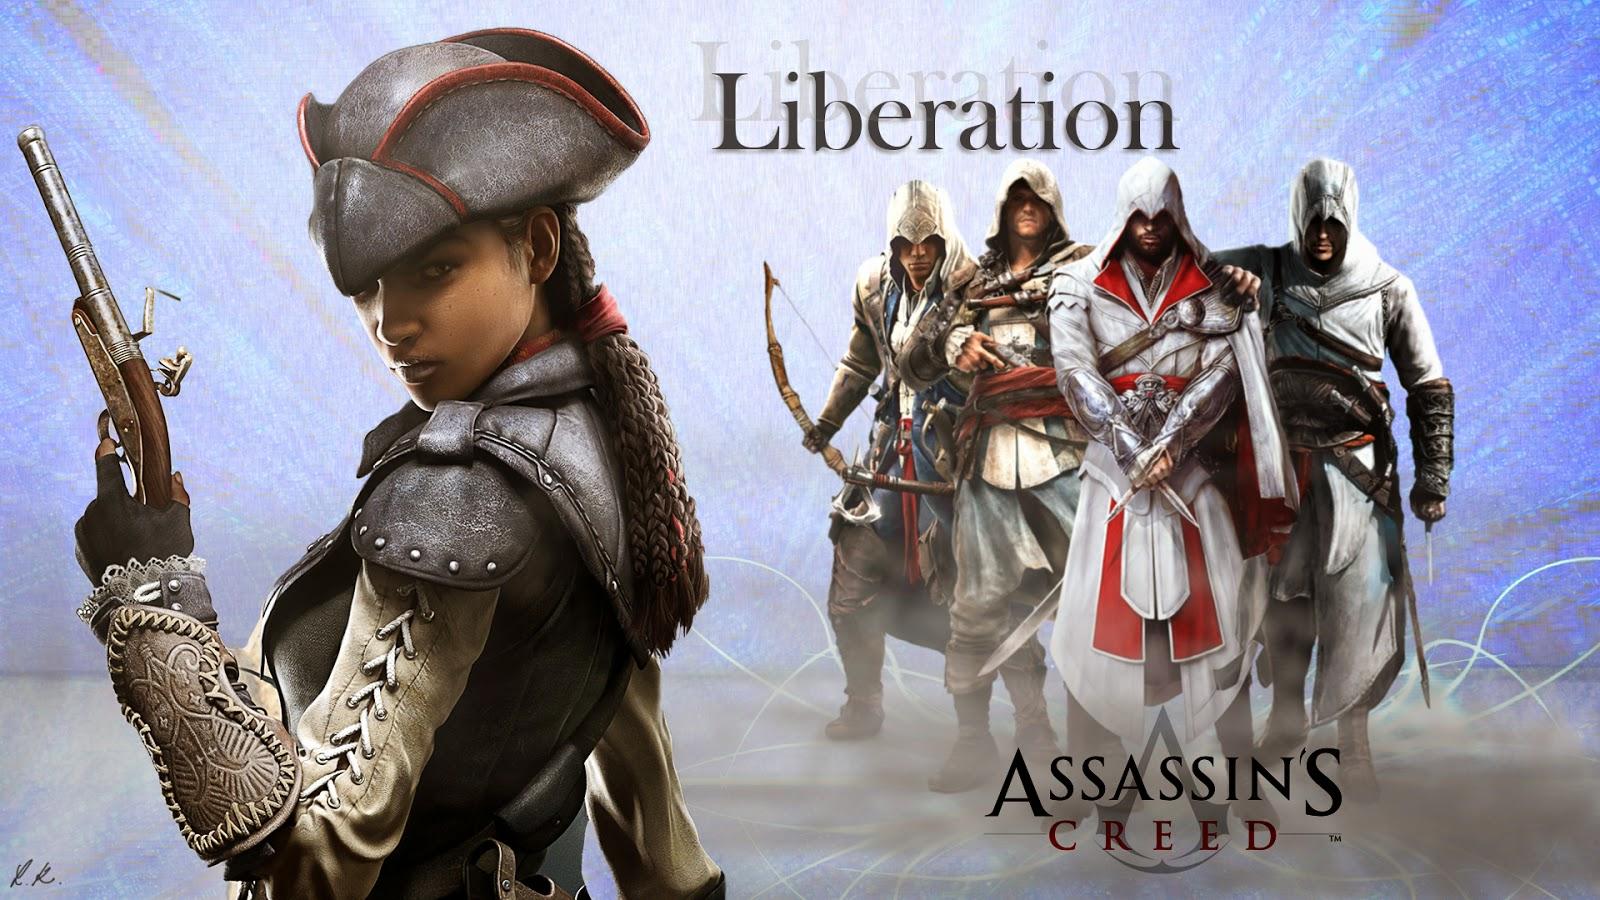 Aveline de Geanpiere Assassins Creed